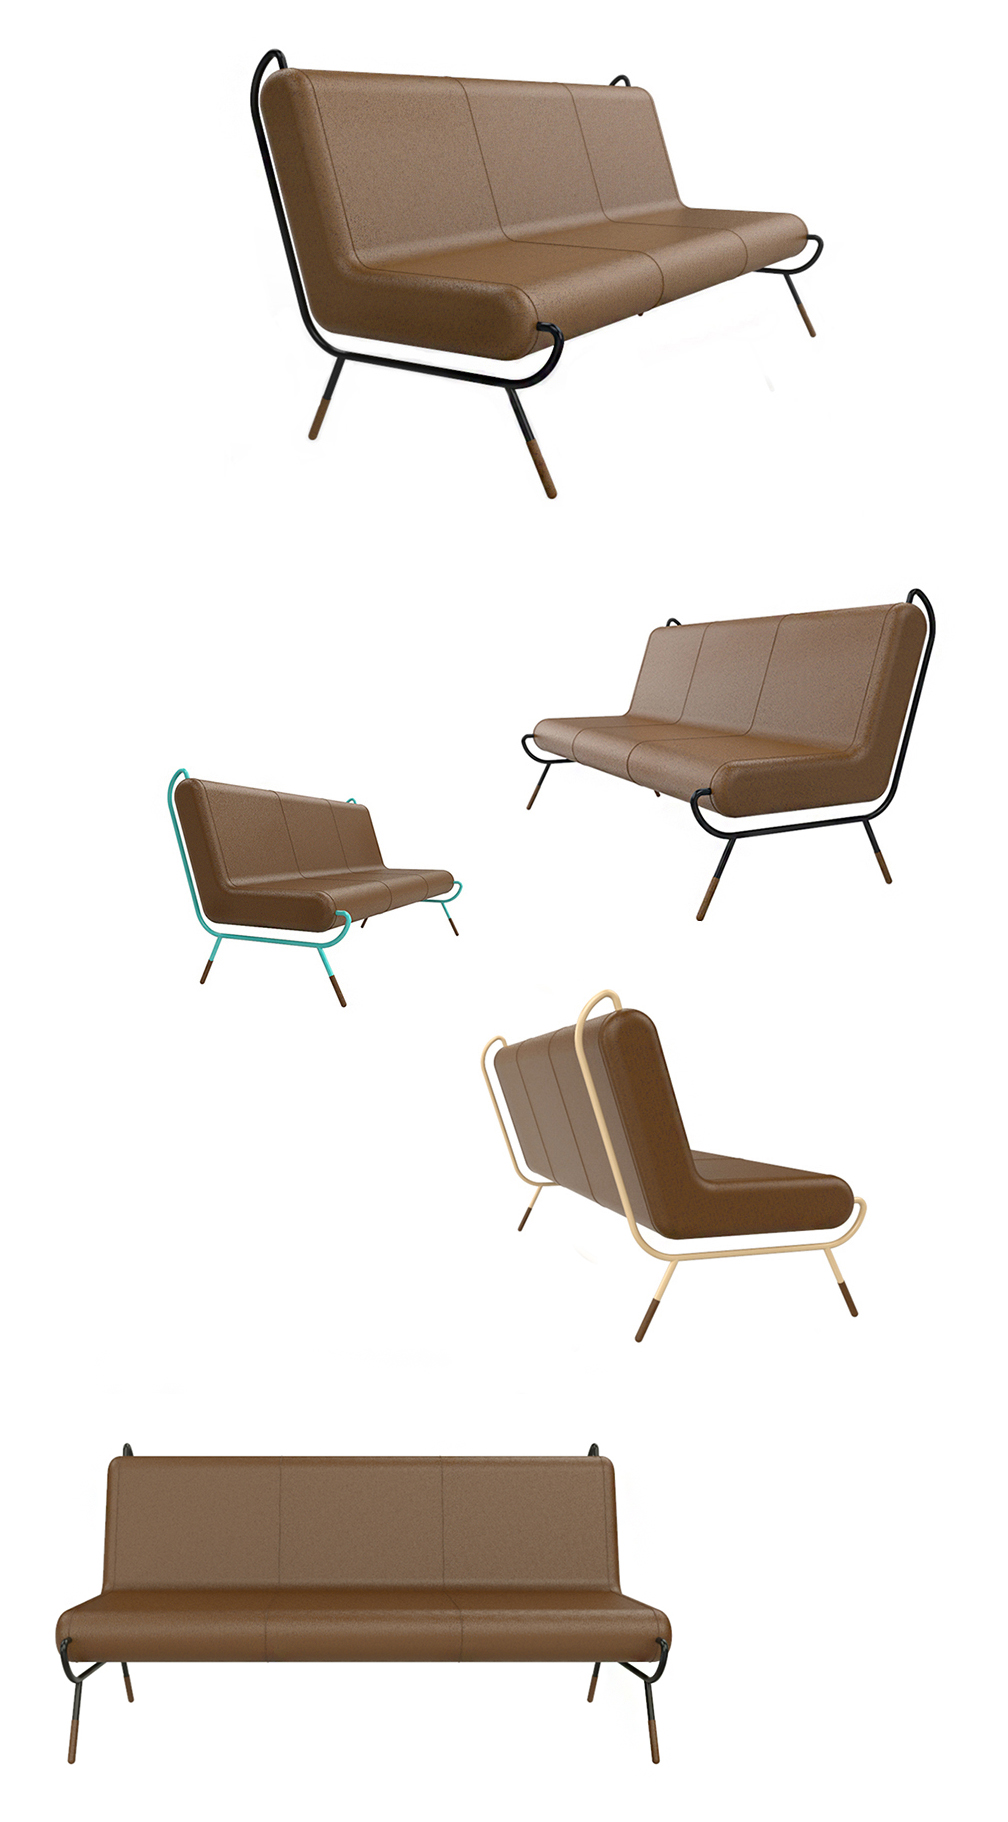 soflof-sofa-pawlowska-design-gl